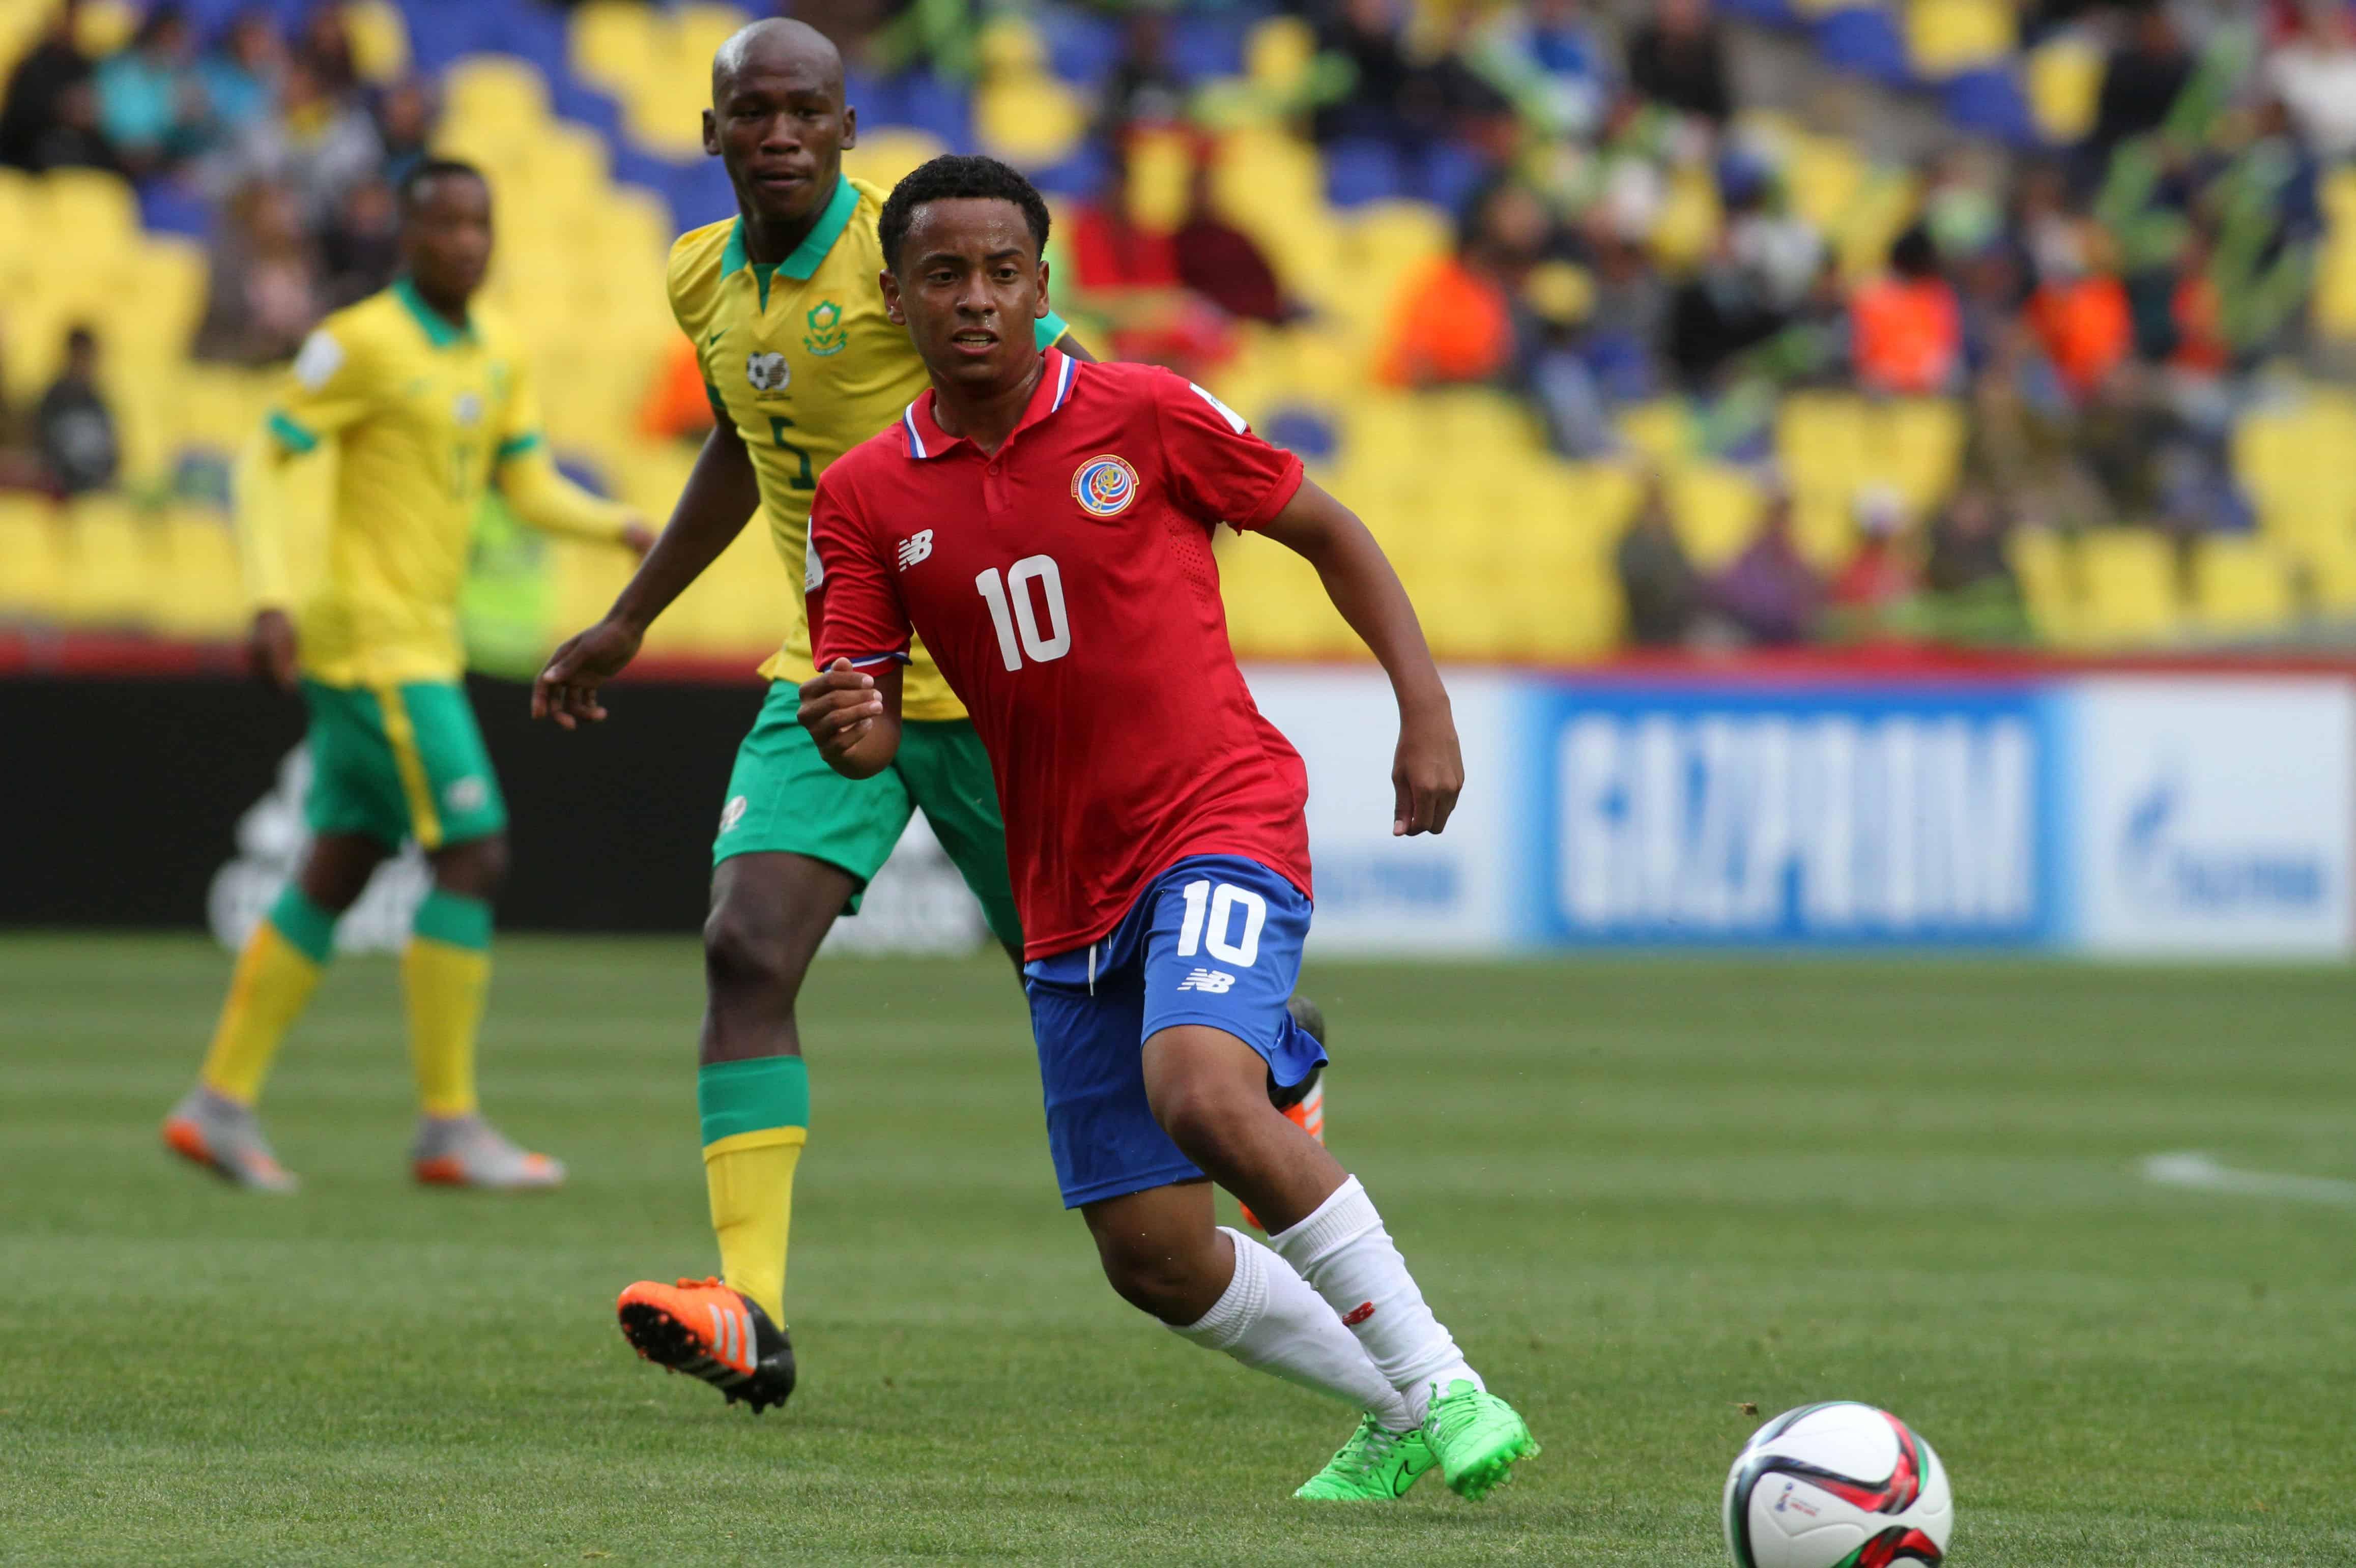 Costa Rica Under-17 World Cup